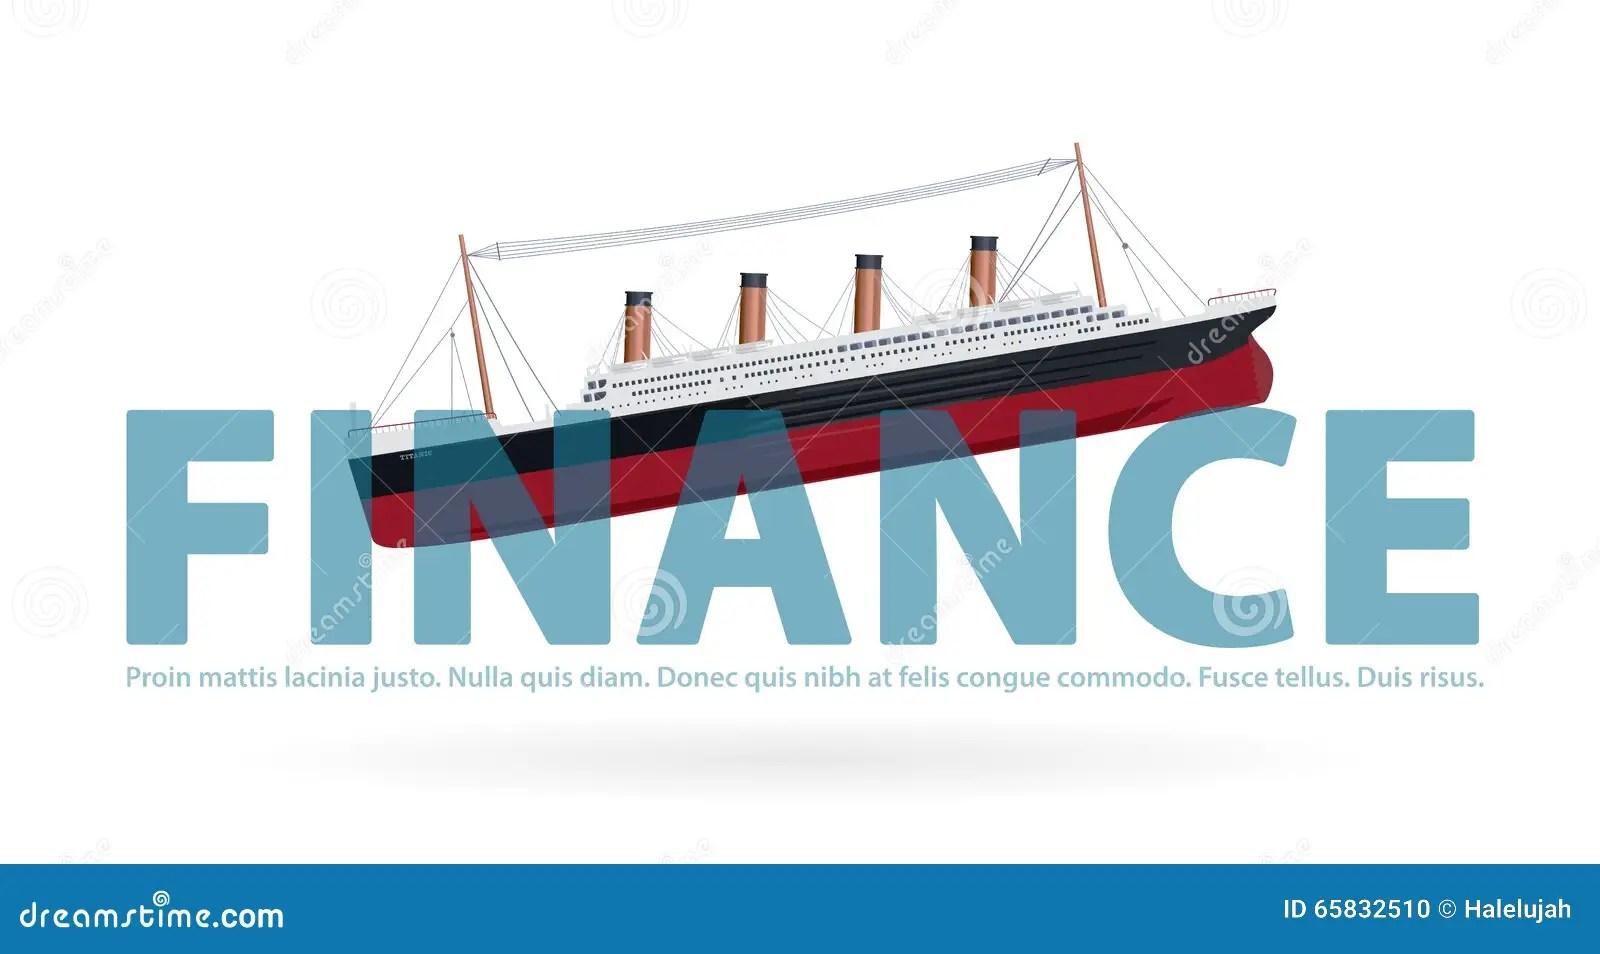 hight resolution of sinking titanic in finance metaphor joke paraphrase quip symbol of bad financial situation